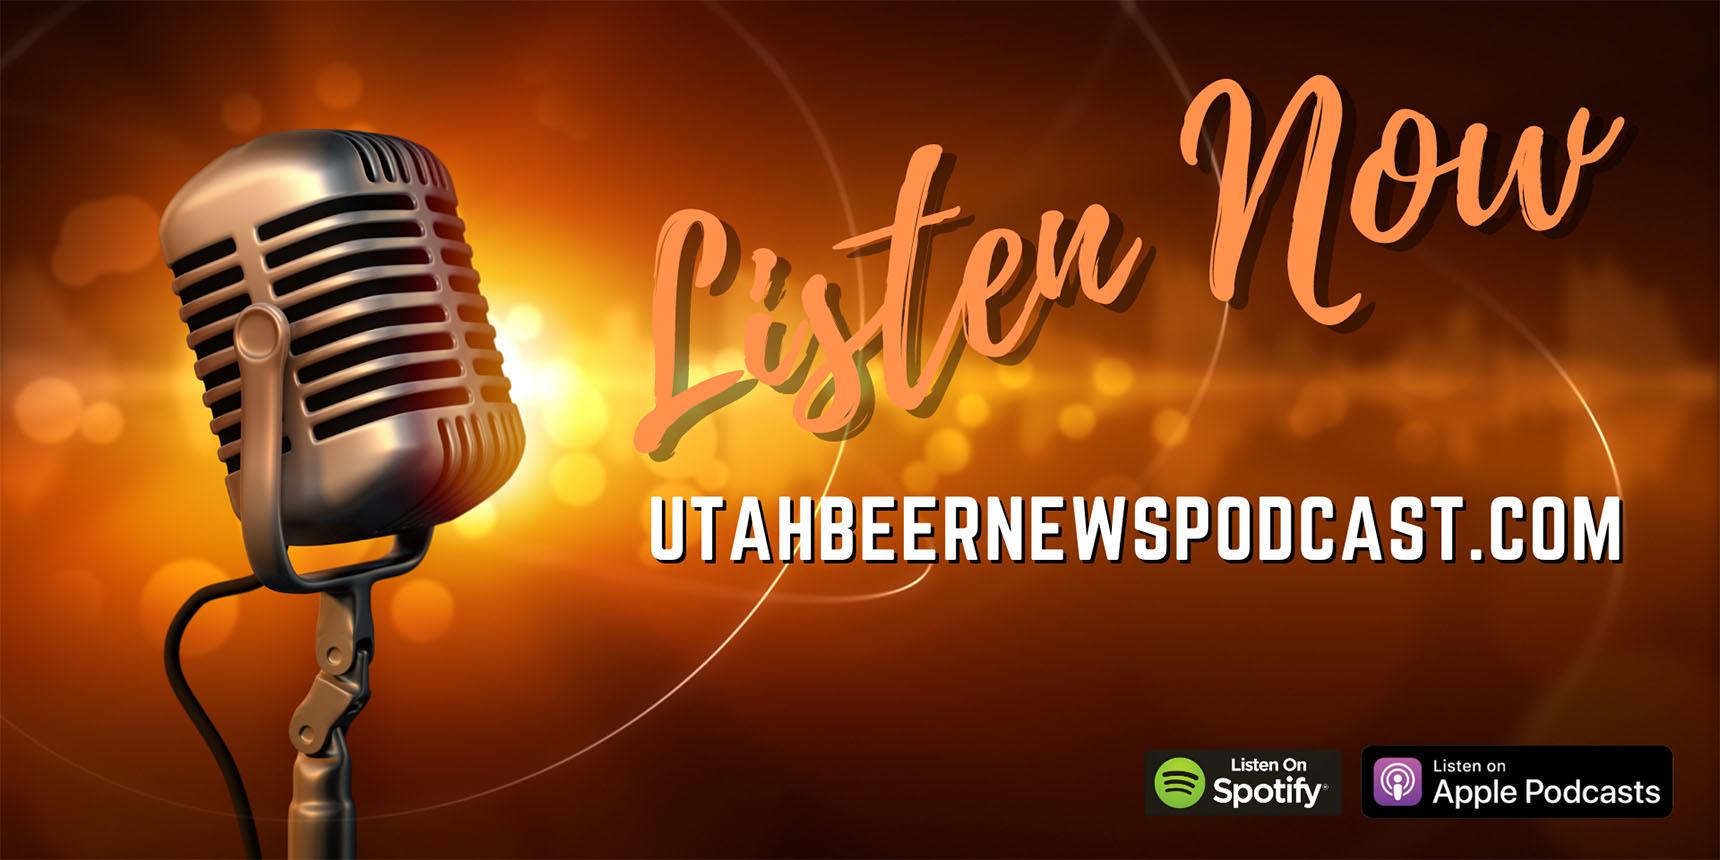 Utah Beer News Podcast